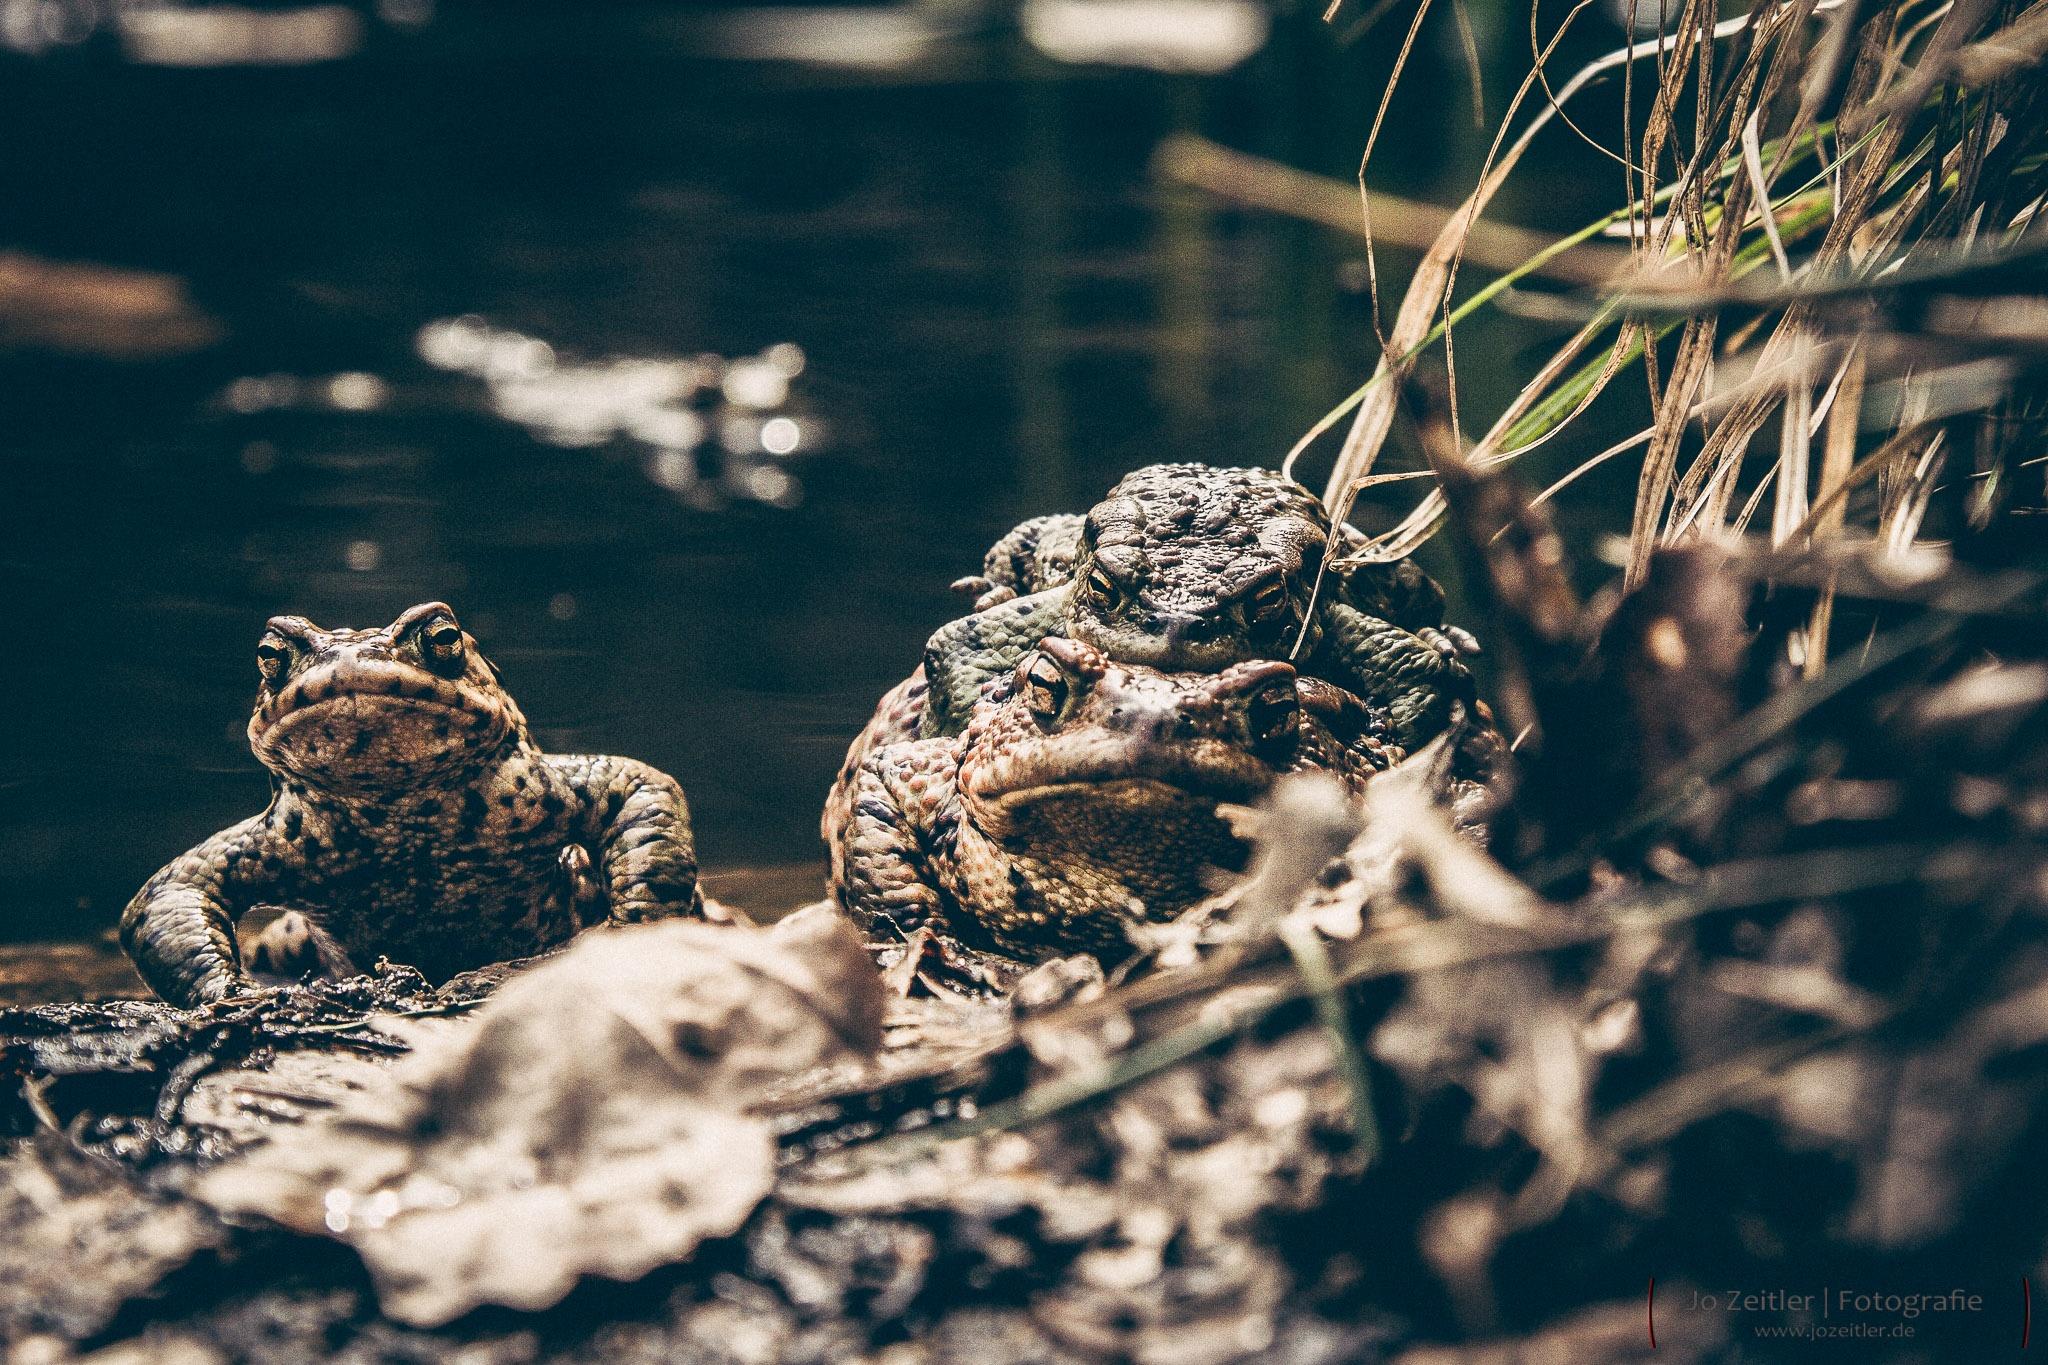 Toad by Jo Zeitler